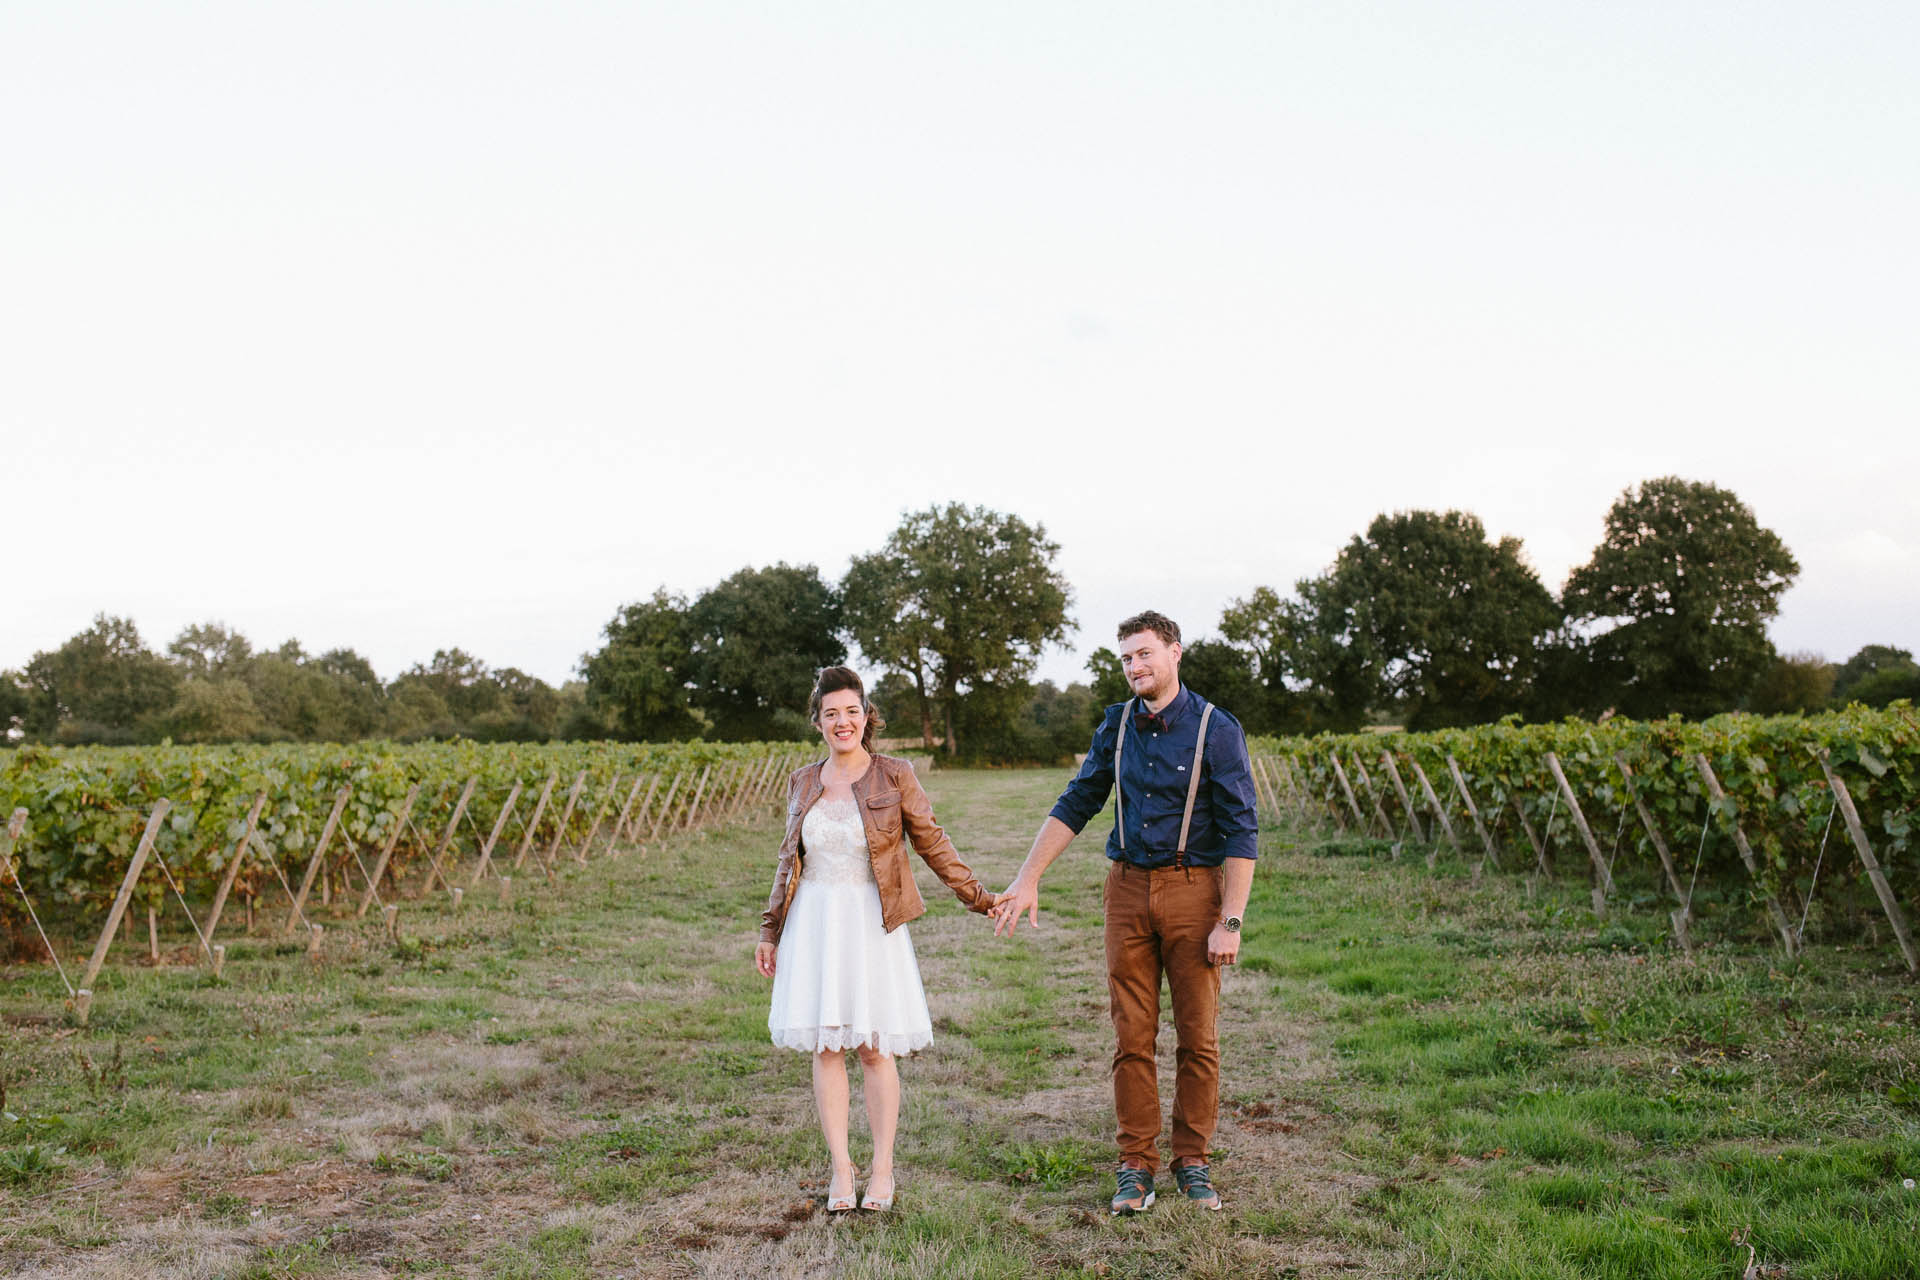 mariage_vignobles_mourat_vendee_jeremy_agathe_flavie_nelly-540